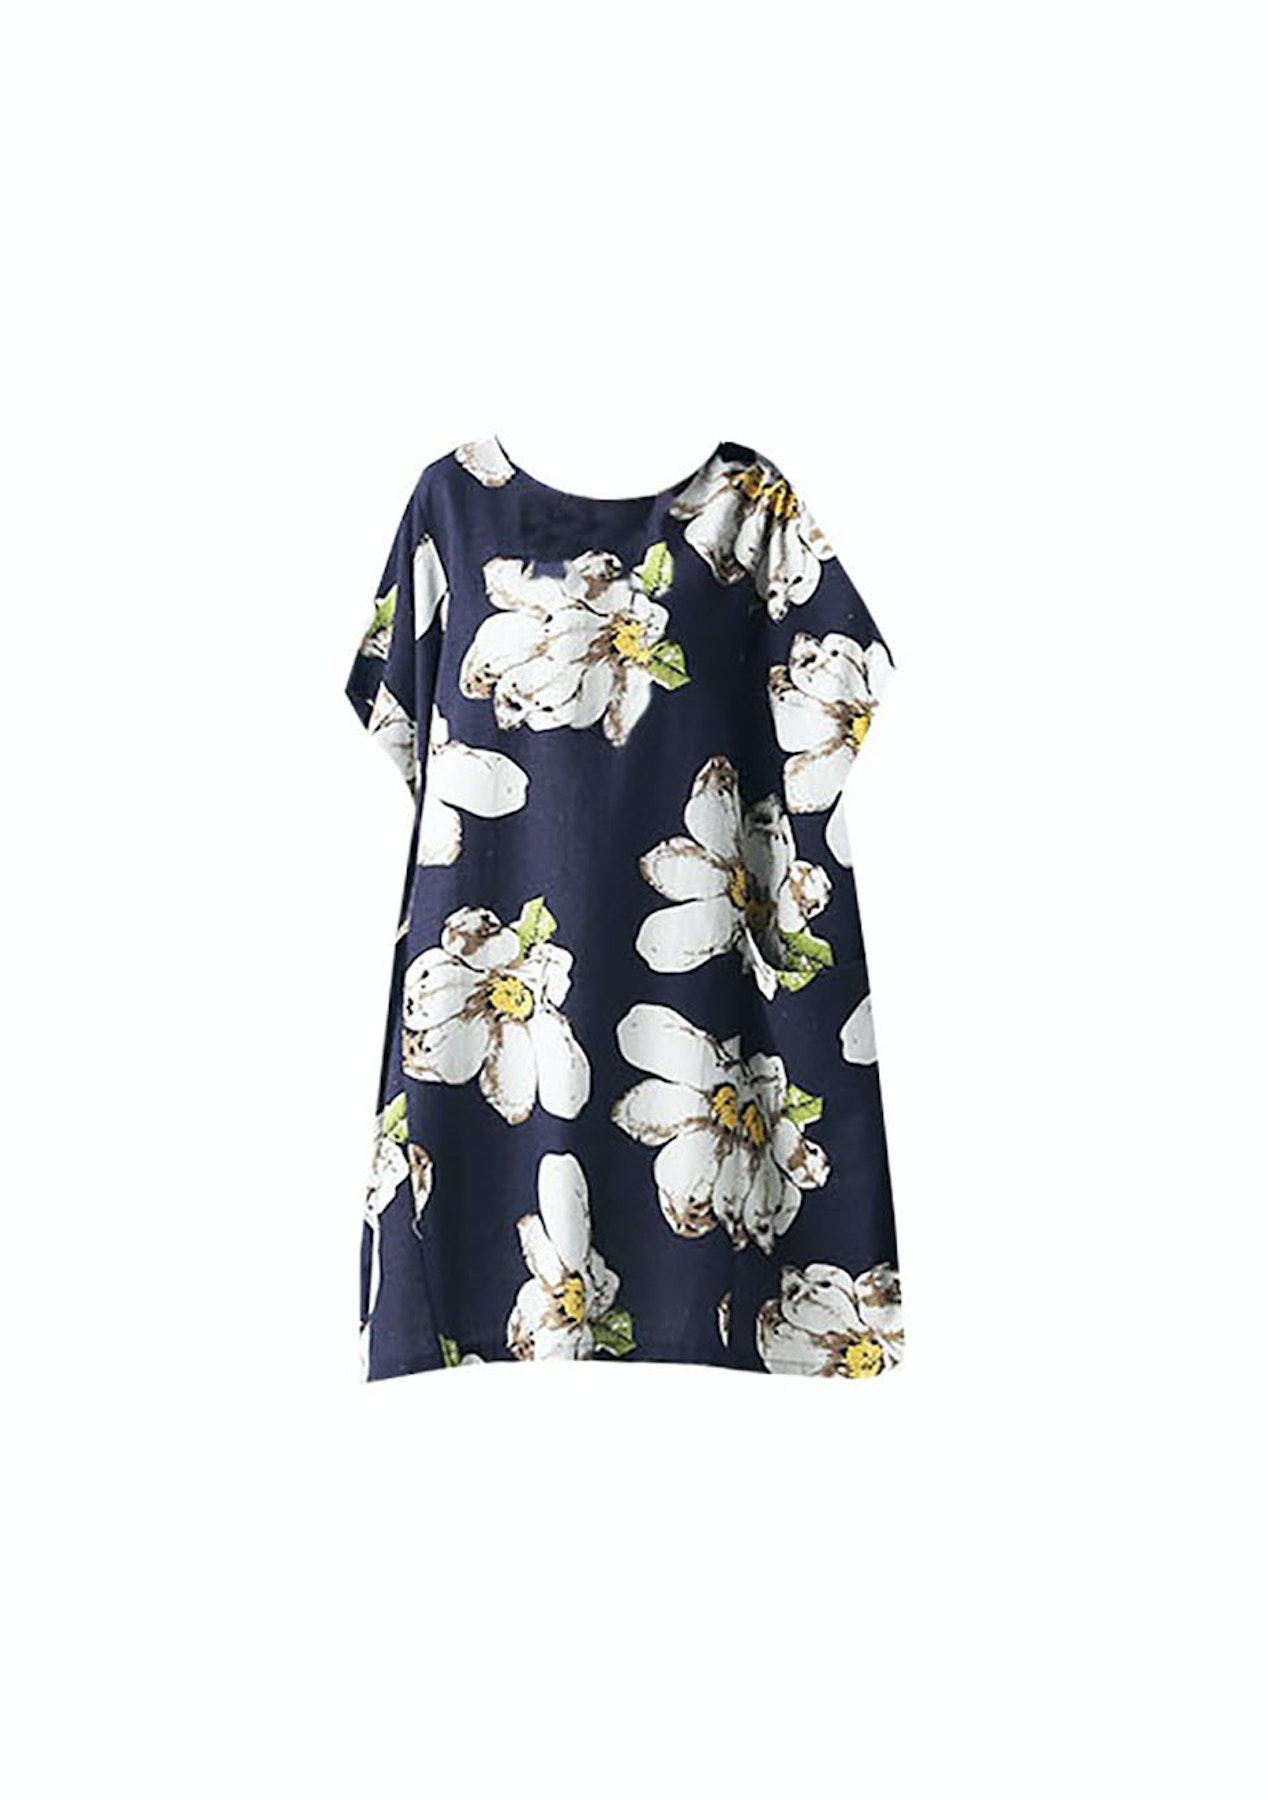 c5f8f4f58 Alyssa Floral Linen Dress - Floral Print - PRESALE Wardrobe Refresh FROM  $29.95 - Onceit